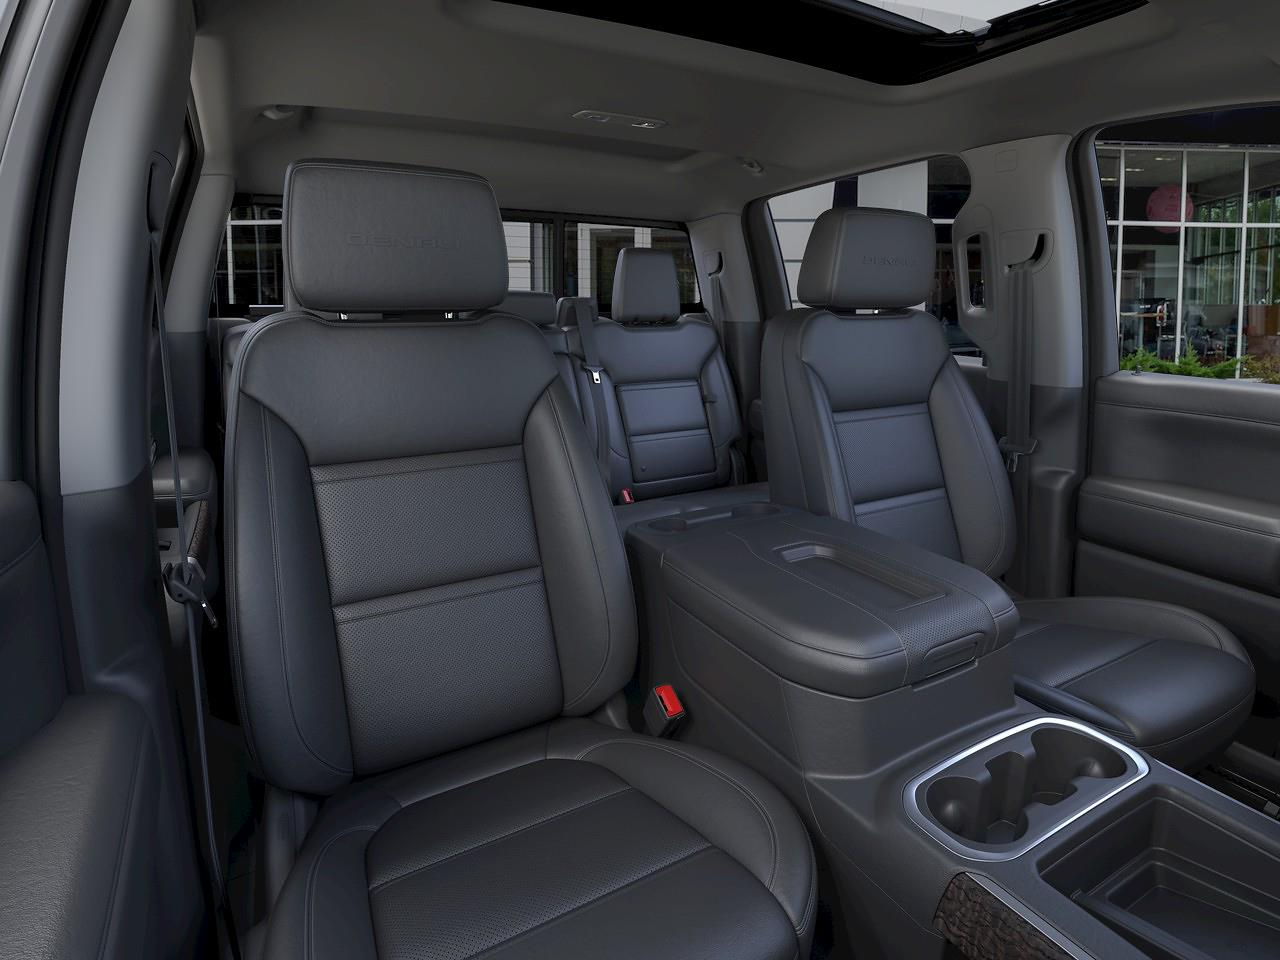 2021 GMC Sierra 1500 Crew Cab 4x4, Pickup #G21427 - photo 13